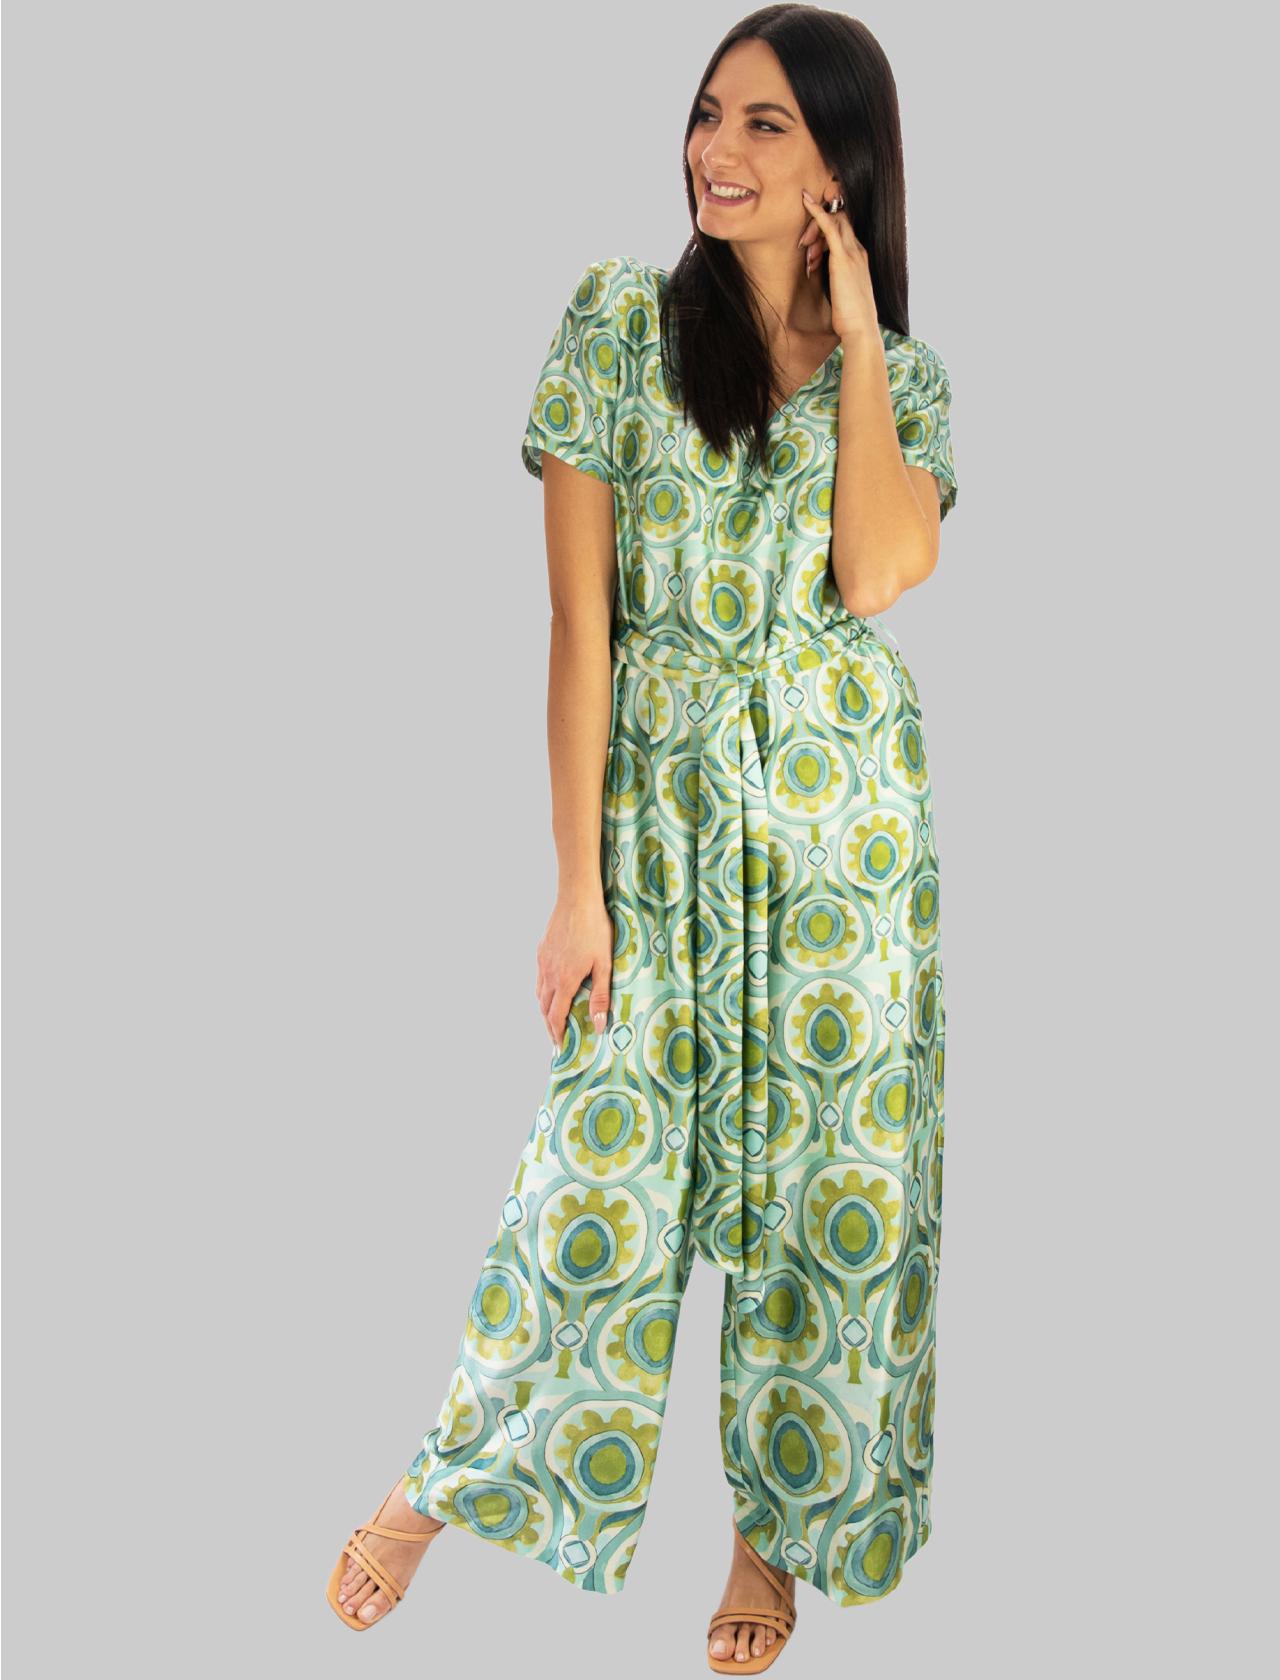 Women's Clothing Long Ottoman Twill Half Sleeve Jumpsuit in Turquoise Maliparmi | Dresses | JU001760046A8207